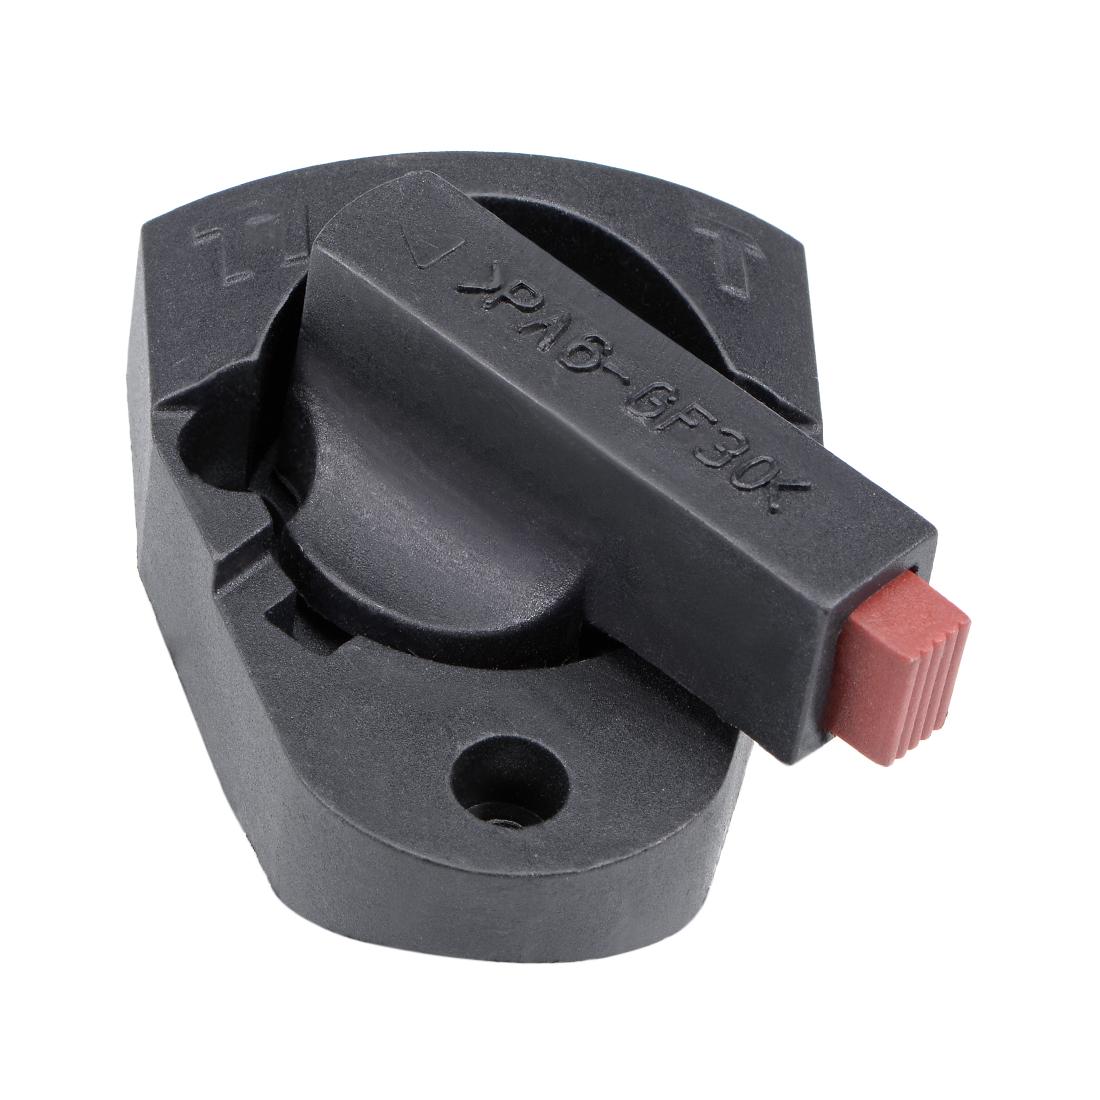 Electric Drill Hammer Trigger Switch Knob Tool Power Adjusting Gear #3